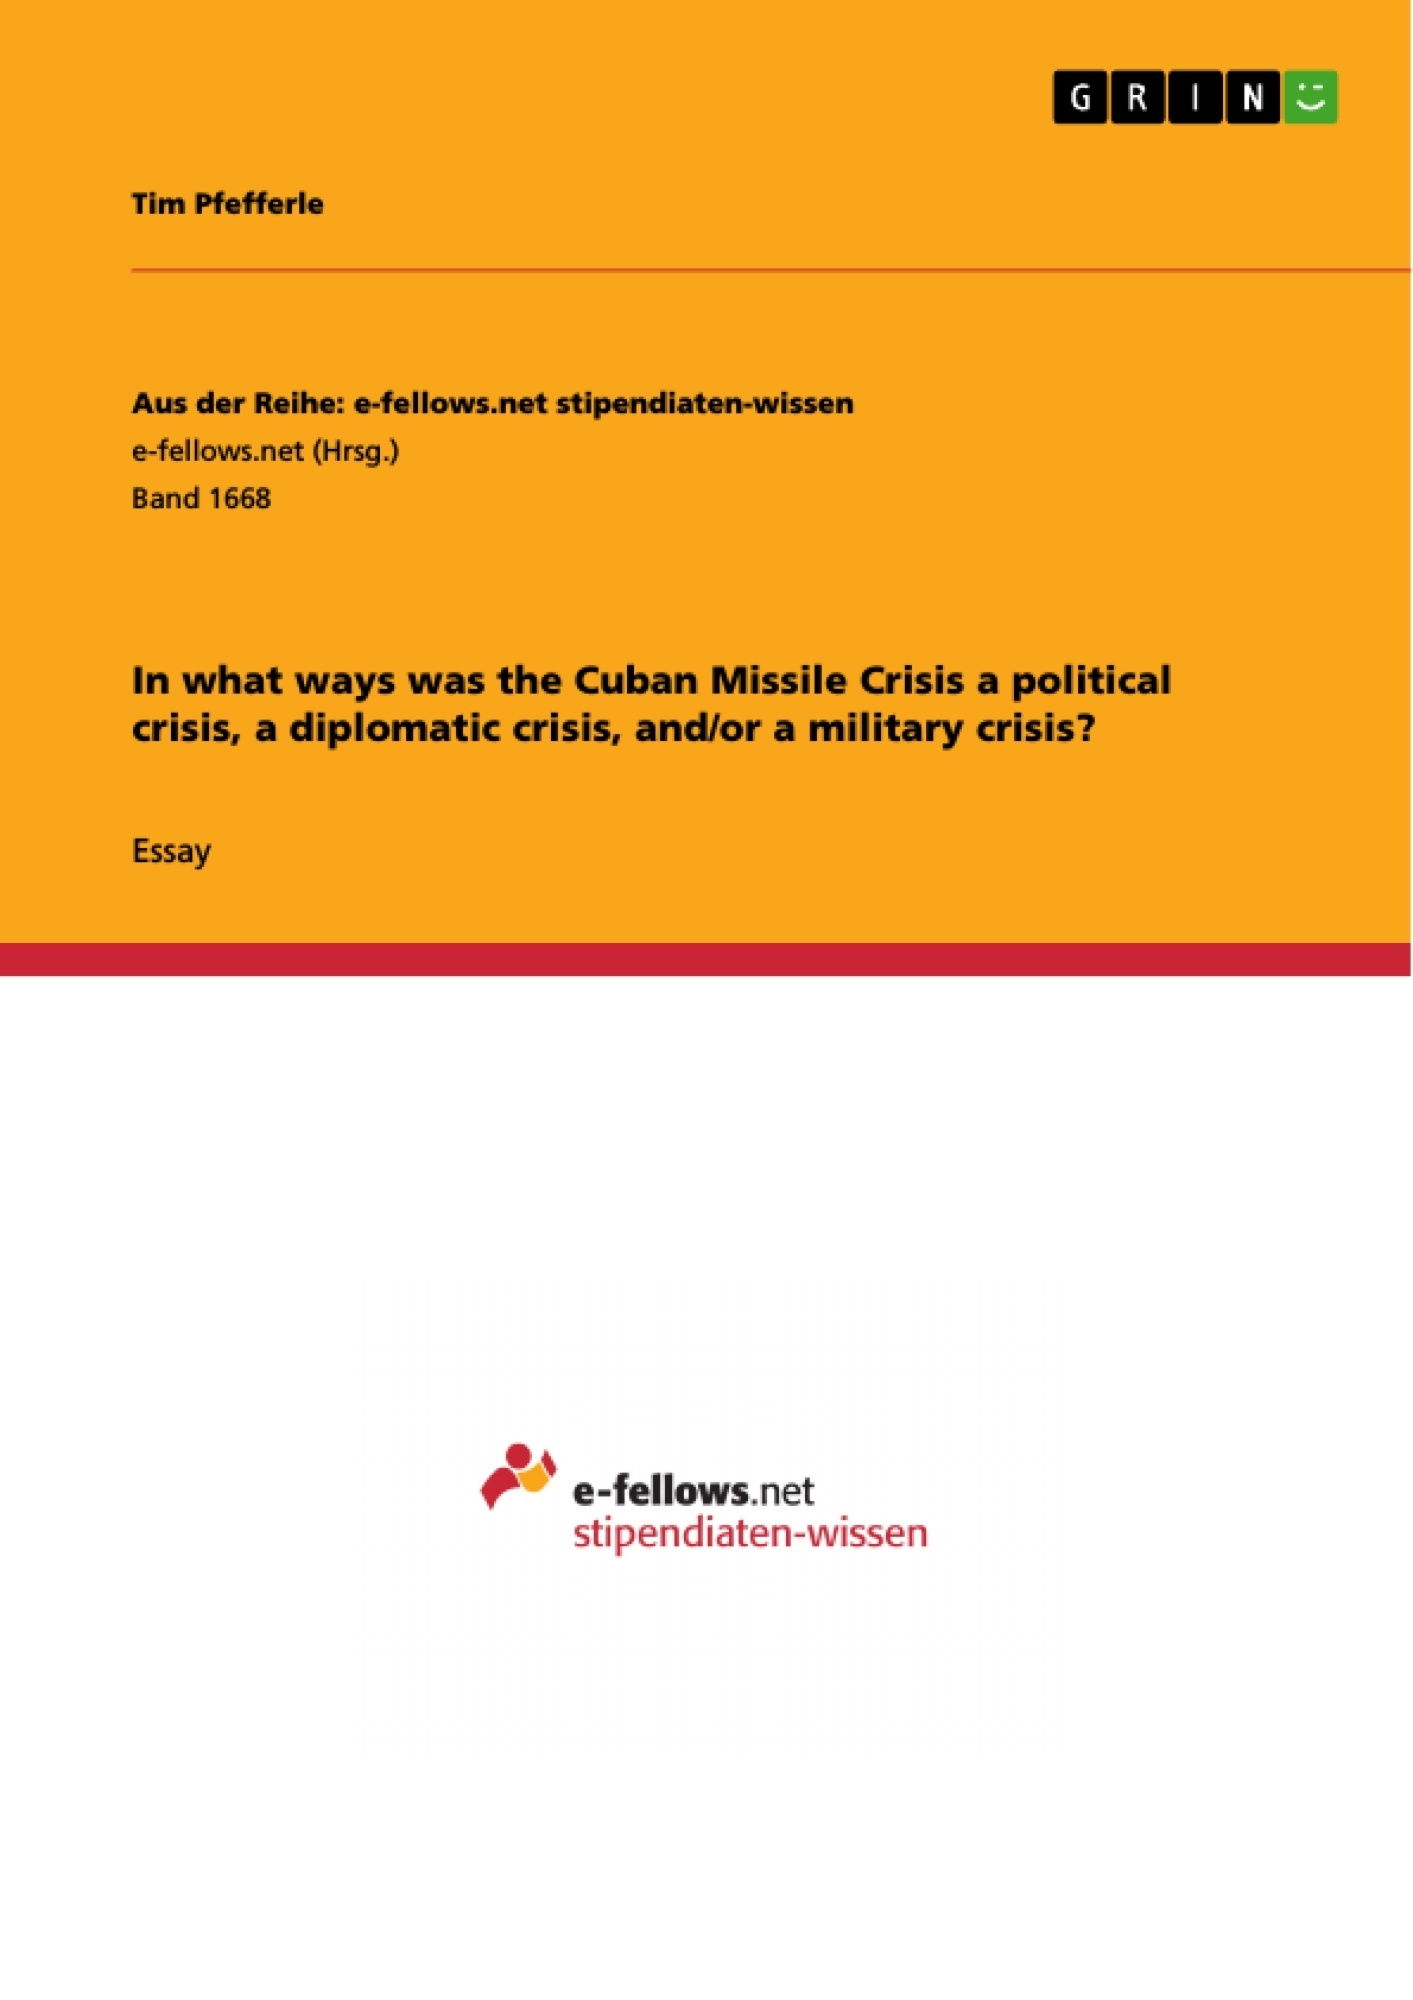 Cuban missile crisis essay introduction